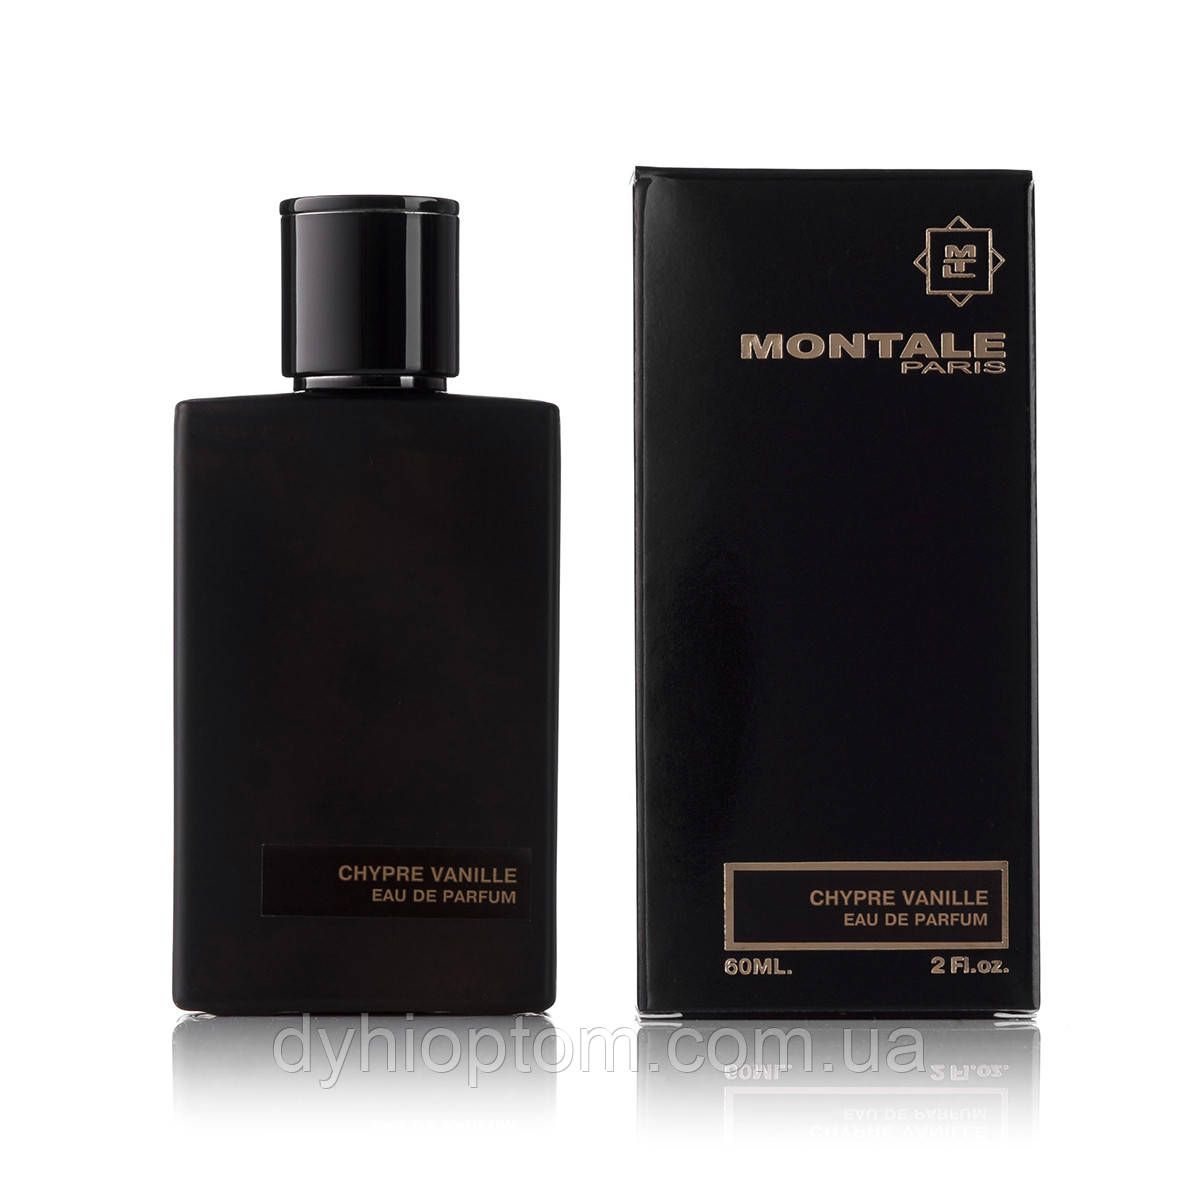 Мини парфюм Montale Chypre Vanille 60мл унисекс